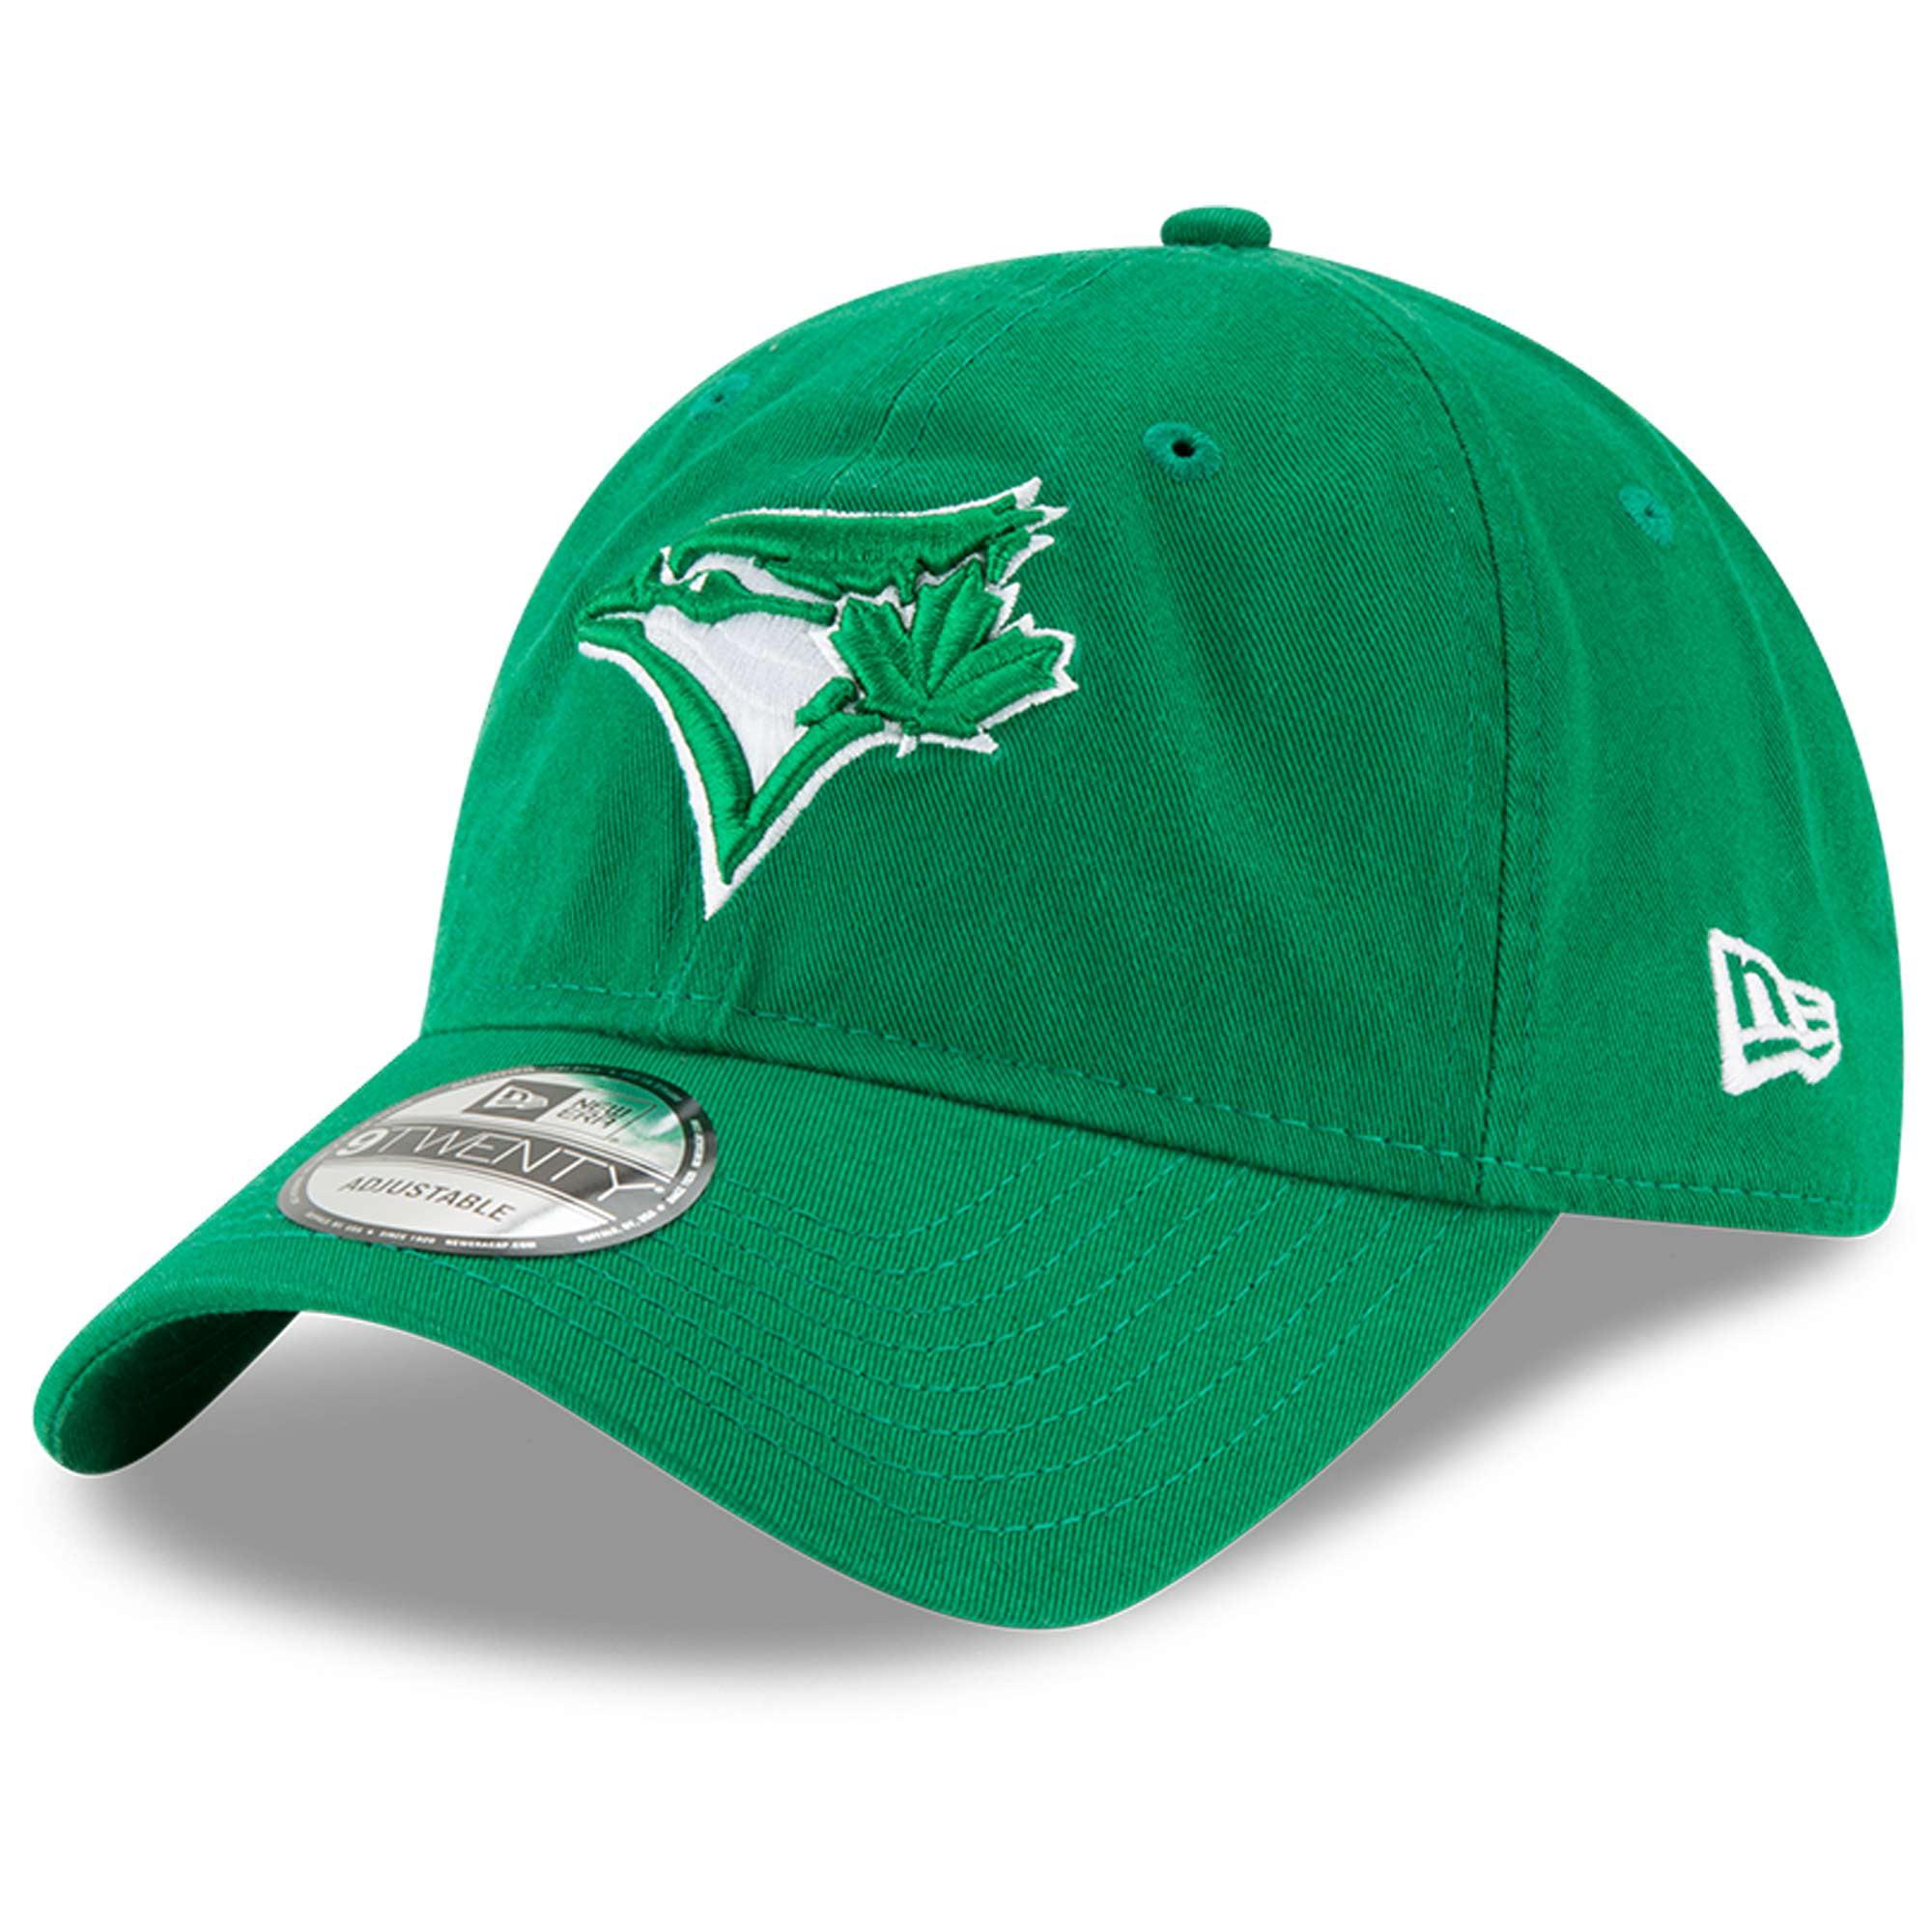 Toronto Blue Jays New Era St. Patrick's Day Core Classic 9TWENTY Adjustable Hat - Green - OSFA